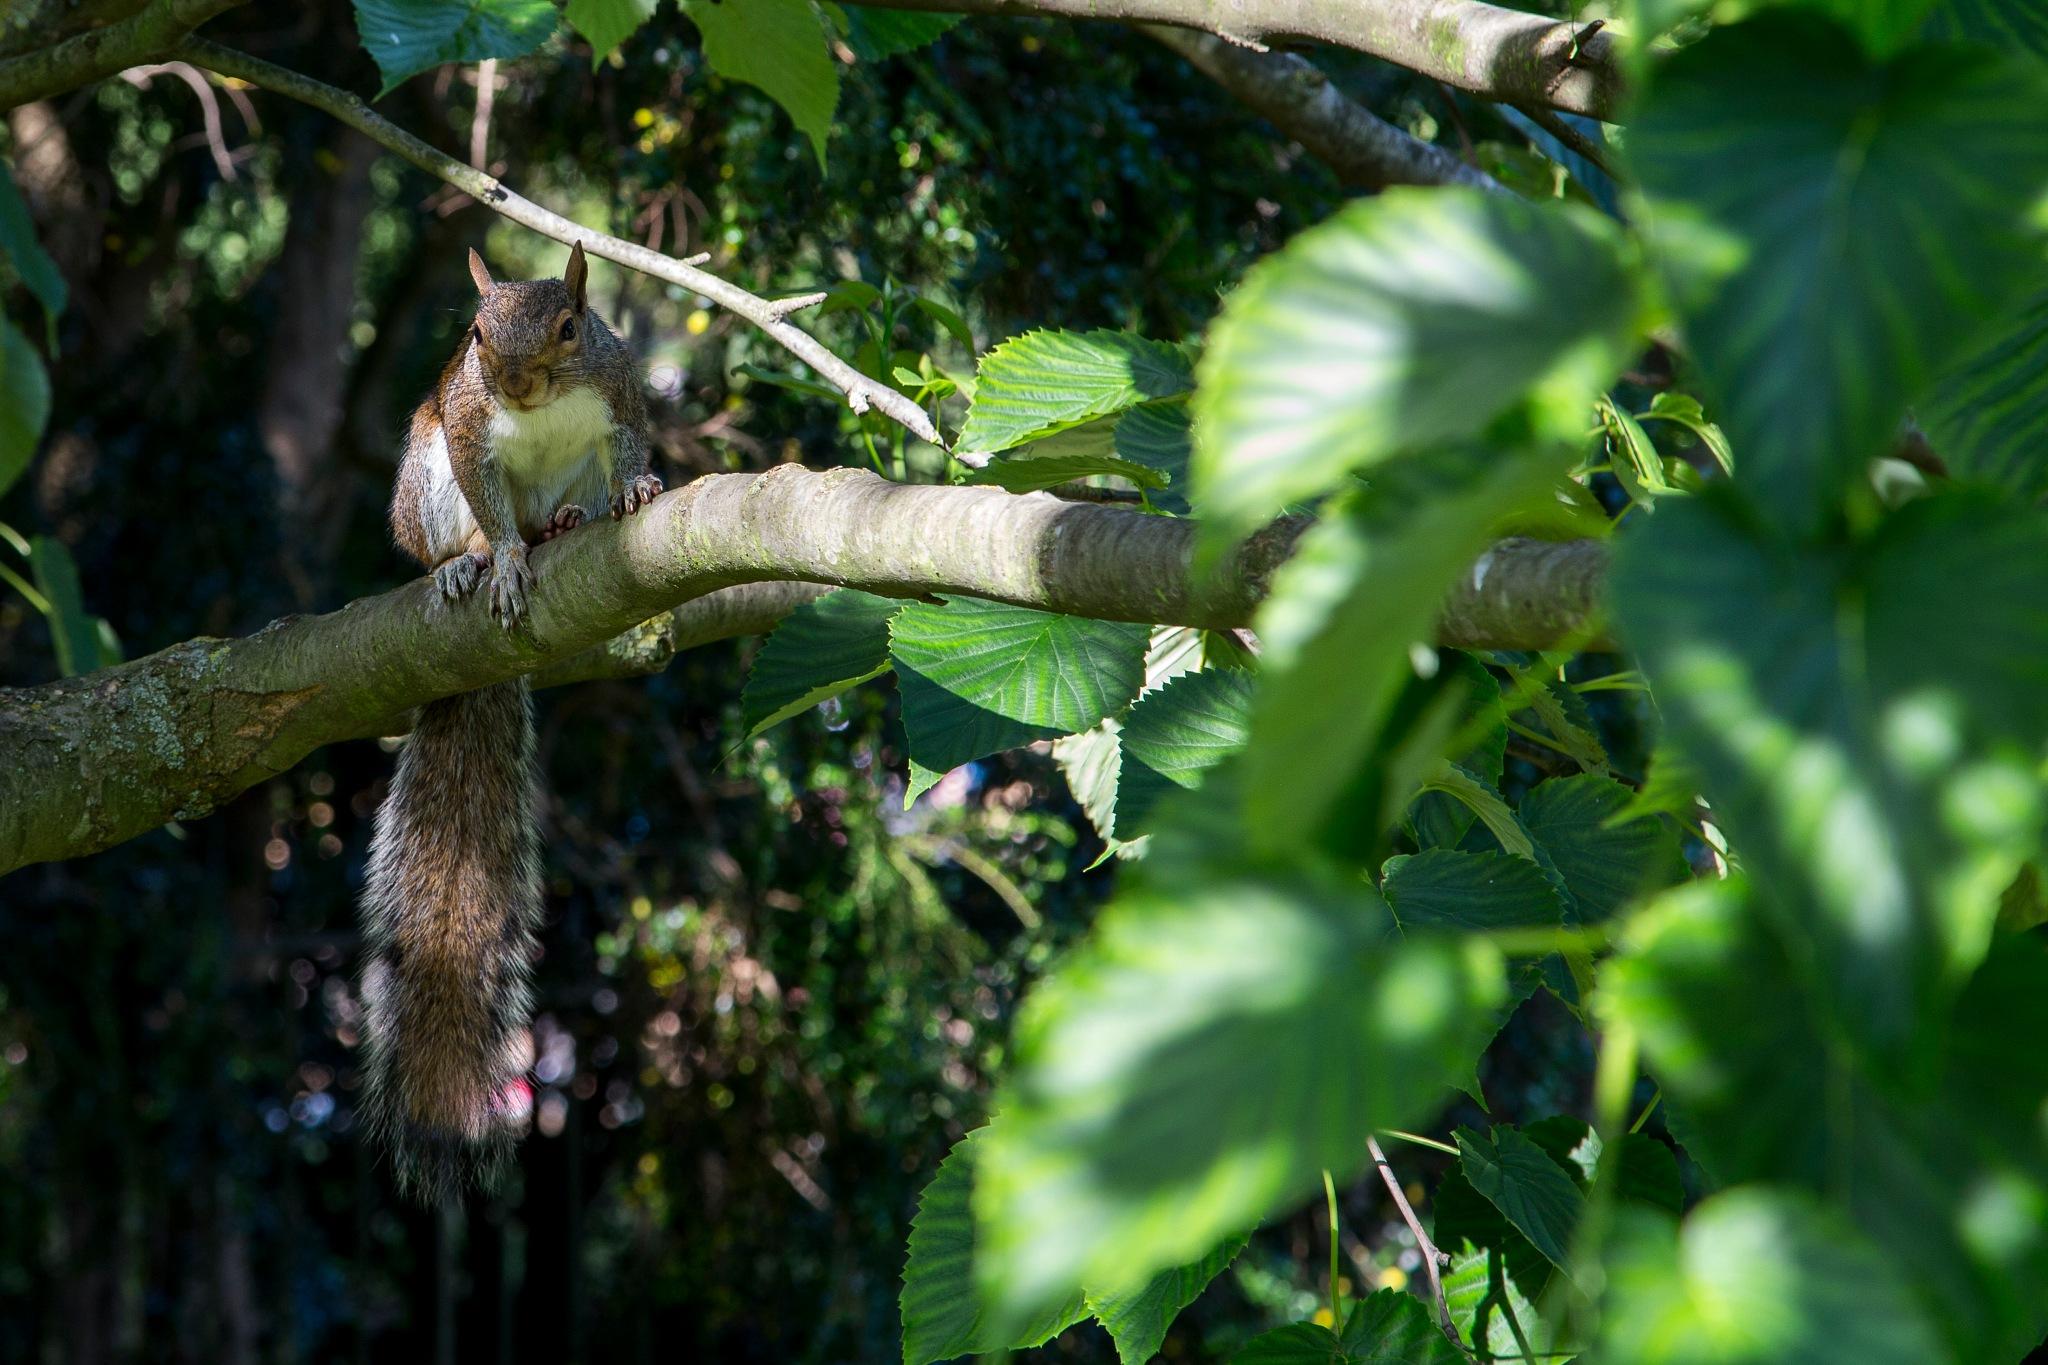 Hyde Park squirrel by Per Thomsen